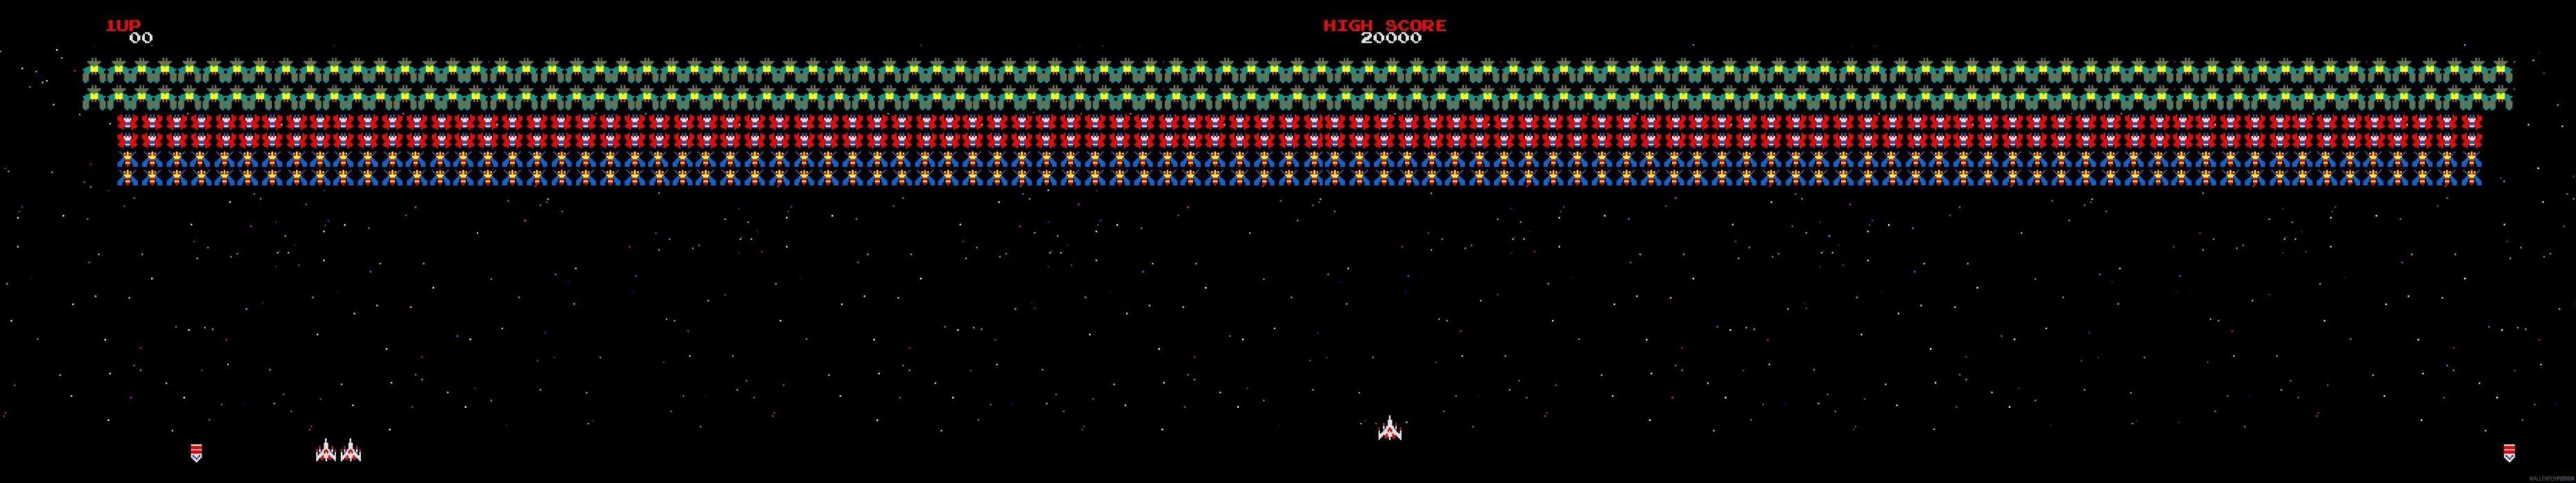 triple screen - multi monitor - multiple - videogame - jeux jeu video - steam - nintendo wallpaper